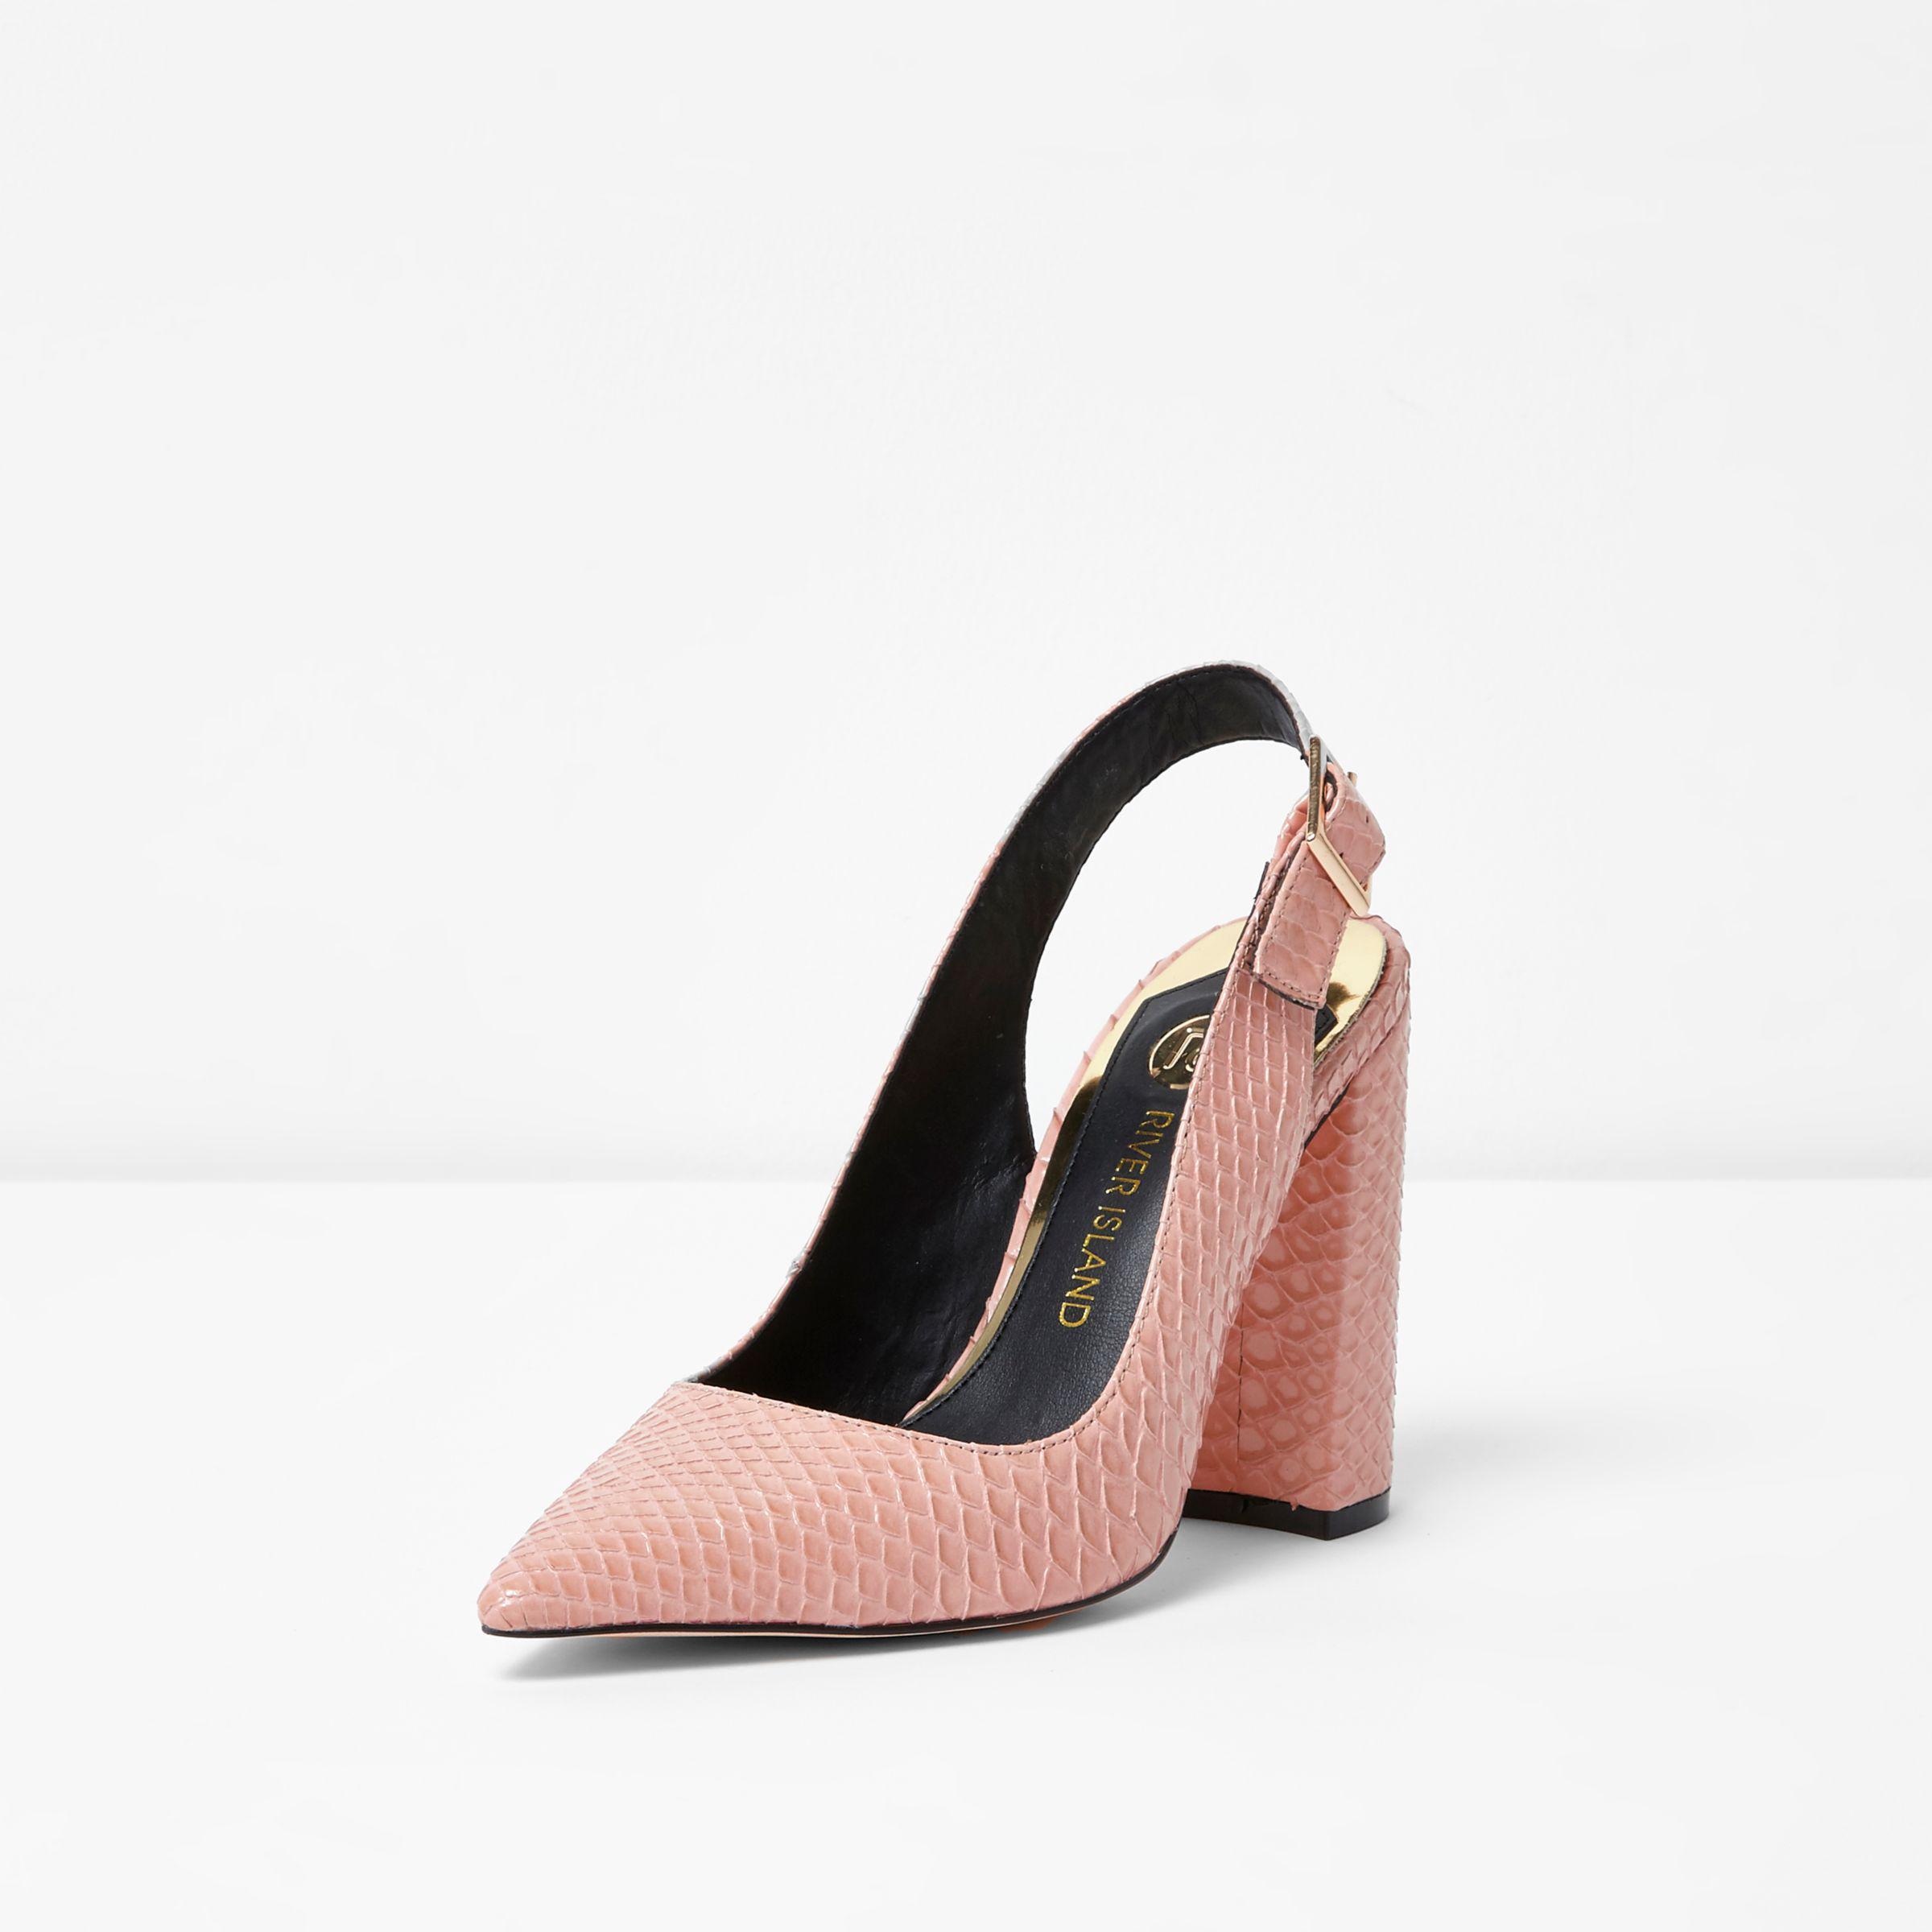 e2bb29f3f9b Women's Pink Snake Slingback Block Heel Court Shoes